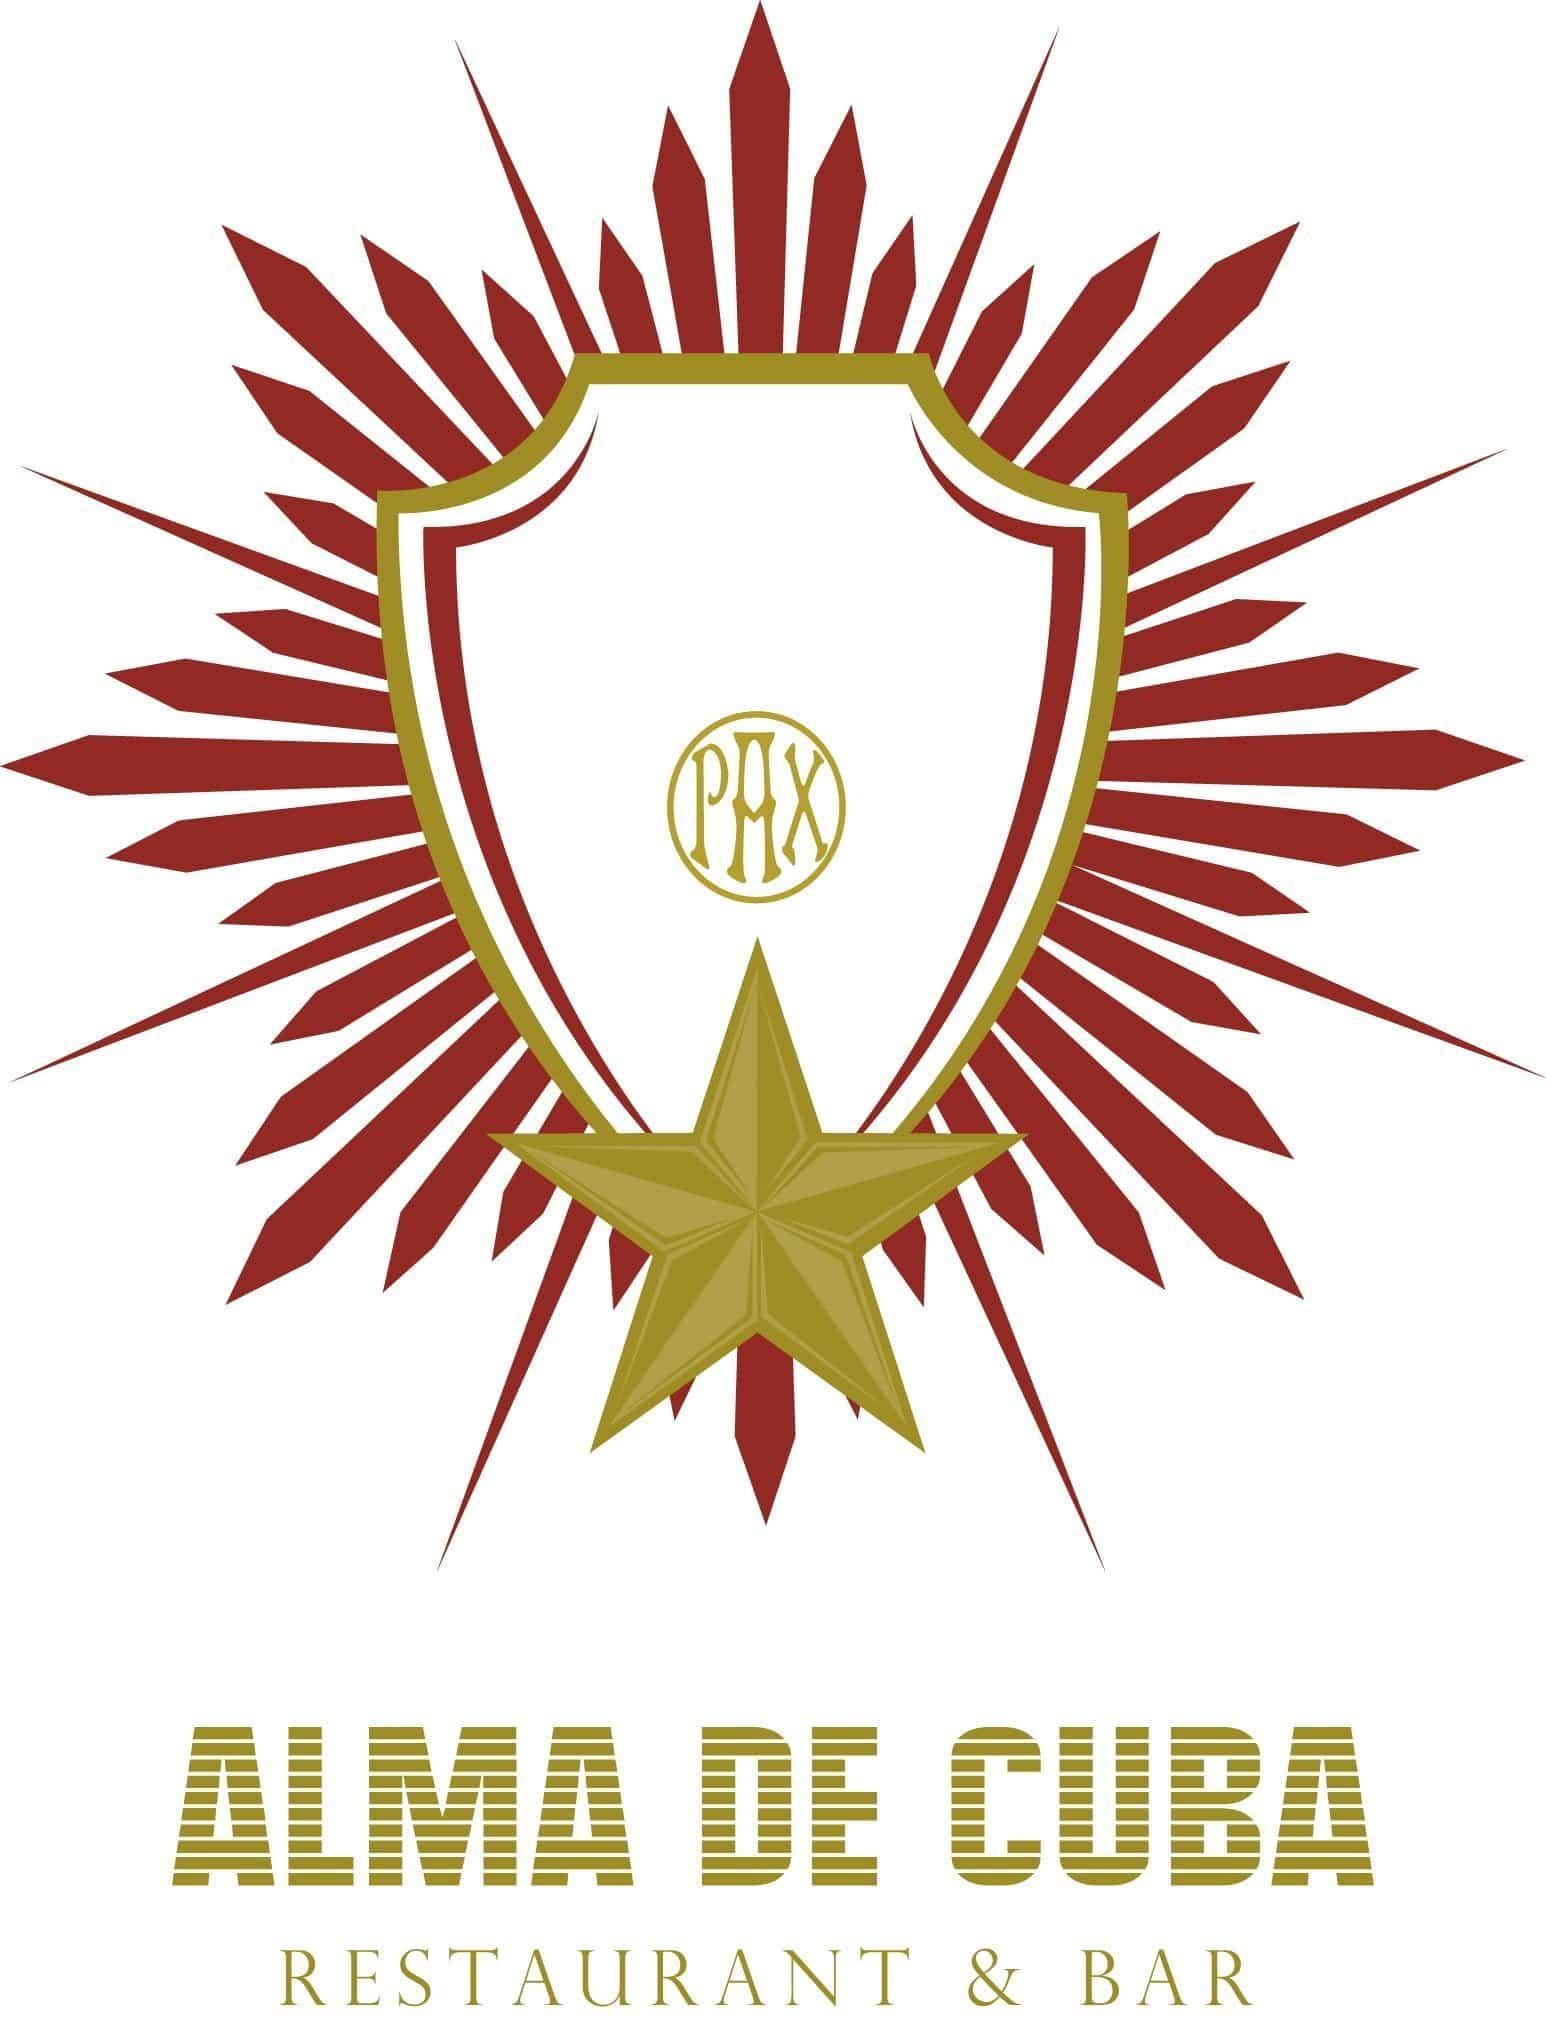 Liverpool Bar 'Alma de Cuba Limited' Avoids Winding Up Petition